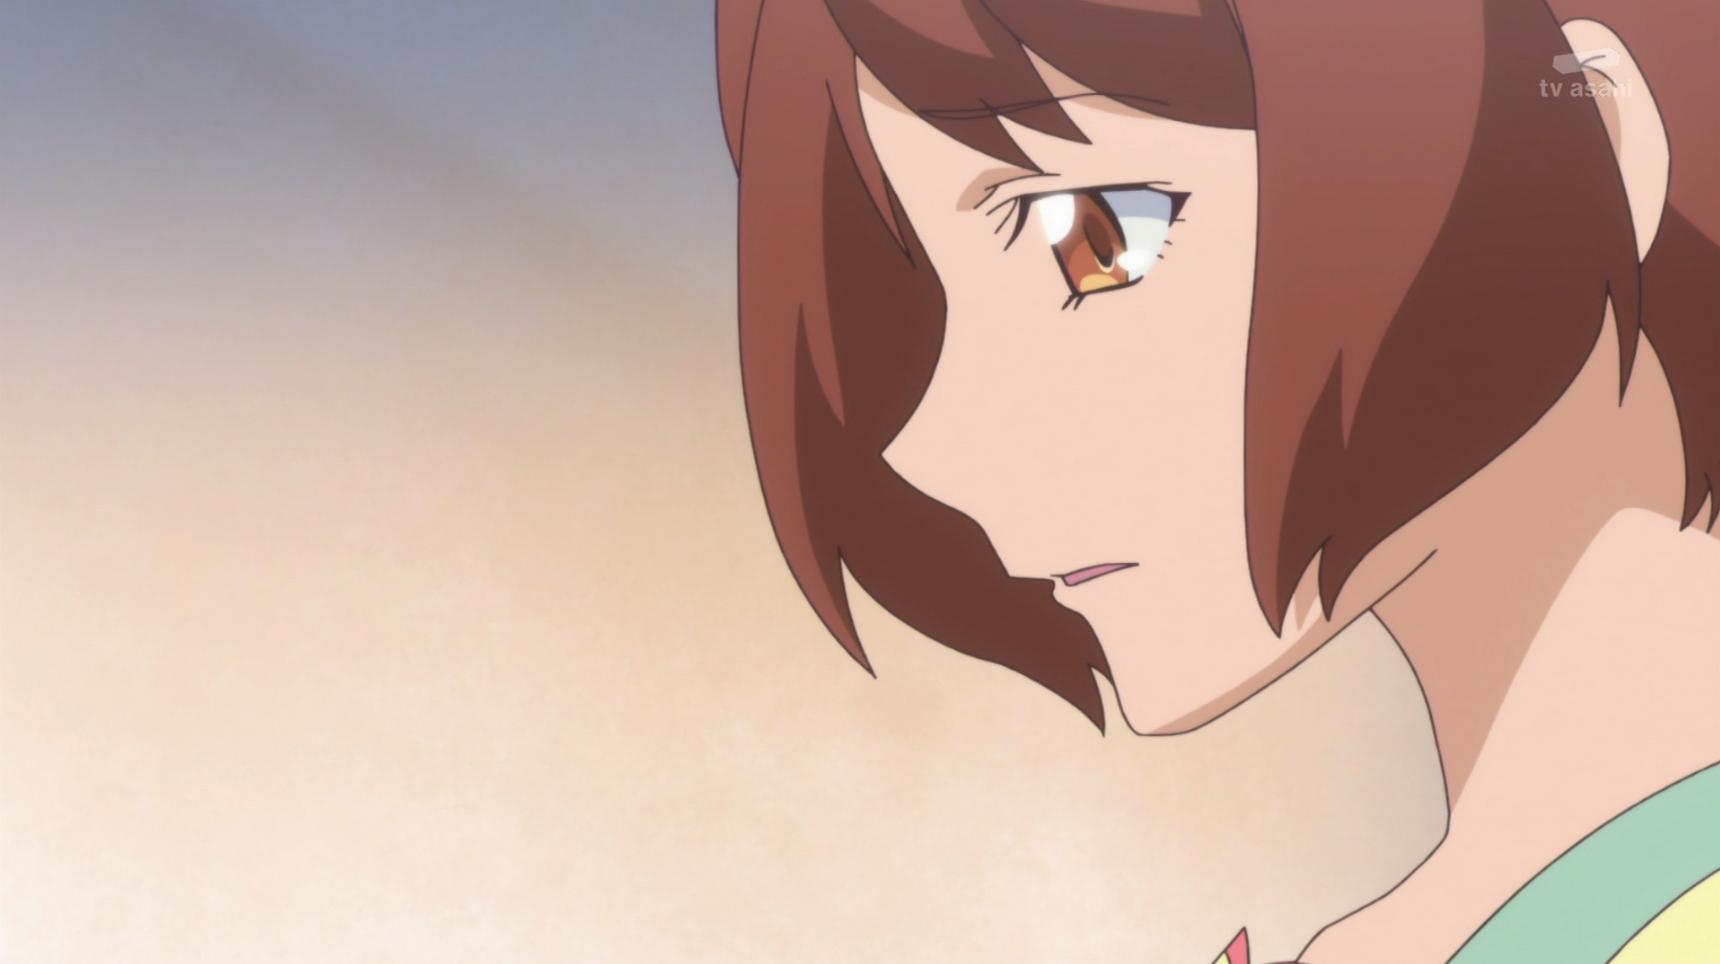 HUGっとプリキュア第35話感想ネタバレ1 (246)